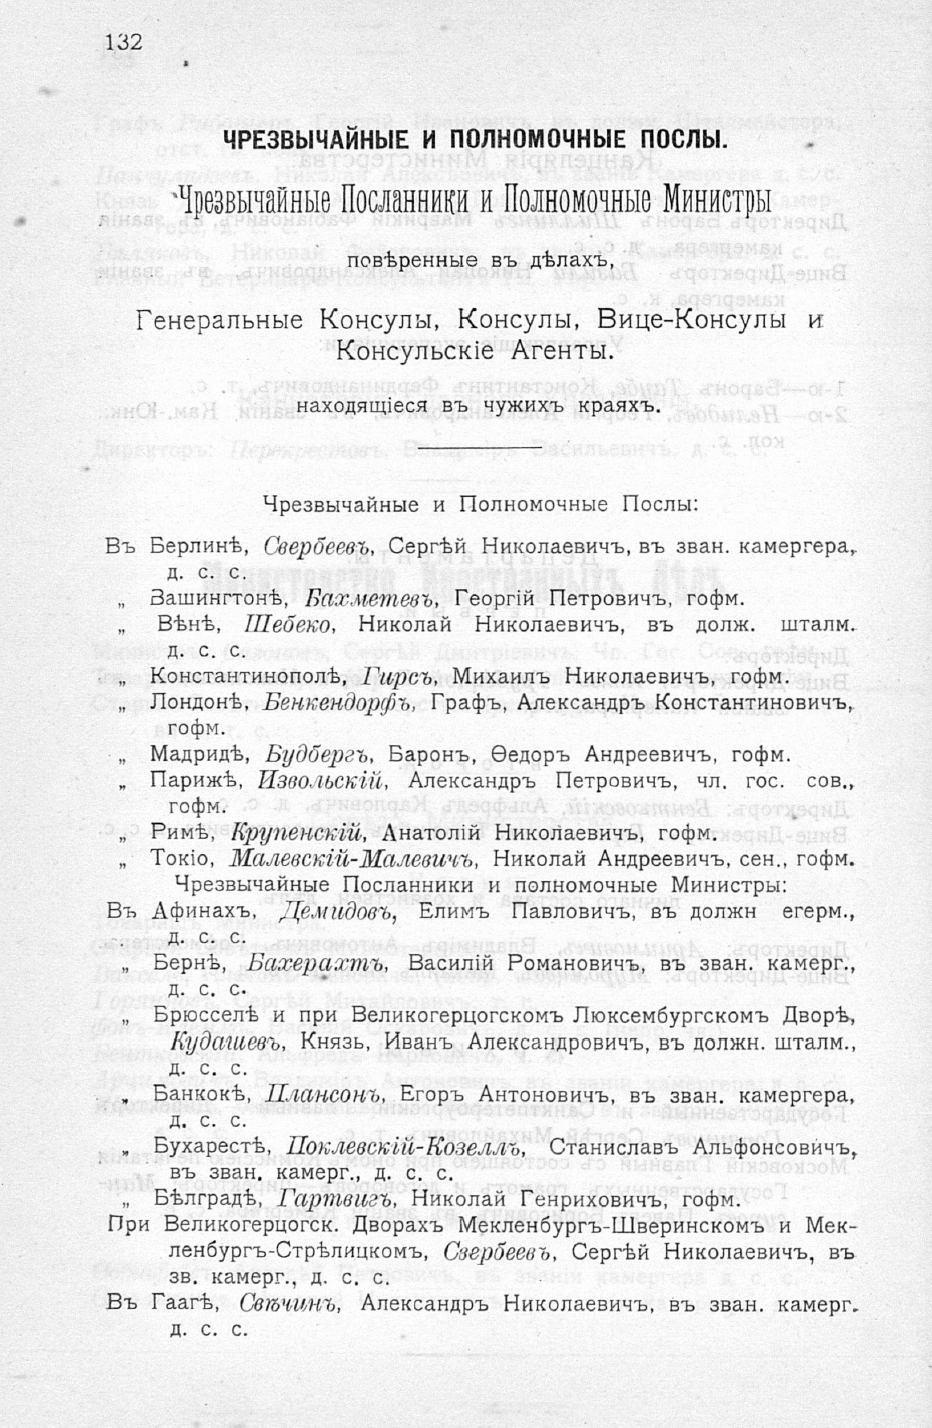 http://images.vfl.ru/ii/1406807979/c8ececd7/5857684.jpg